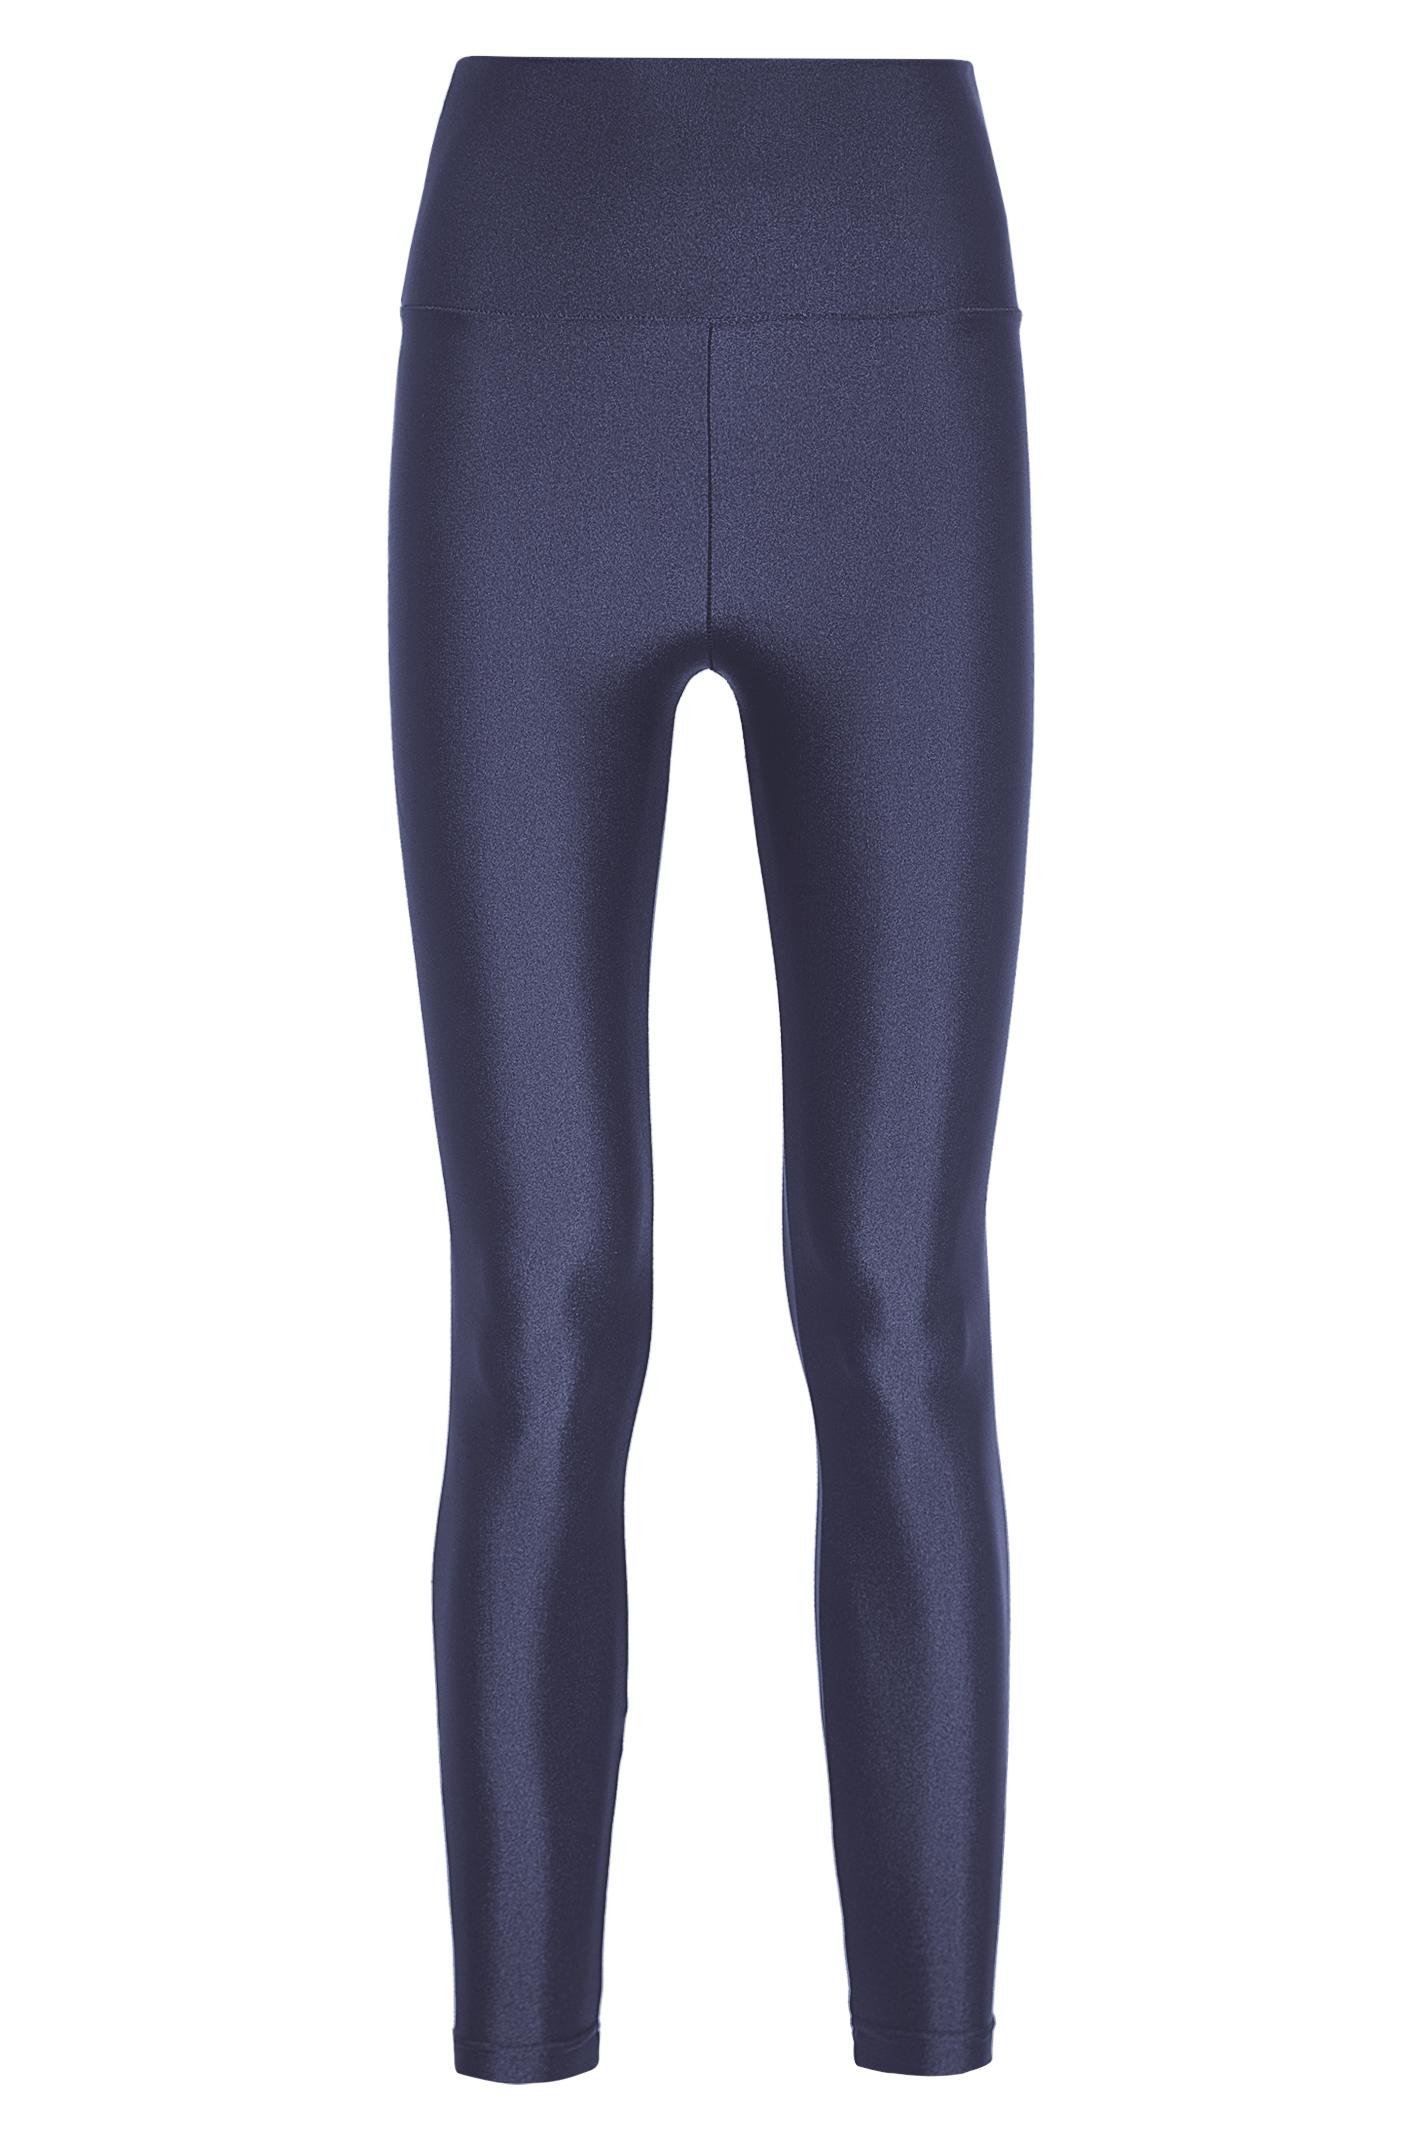 Calça Legging Lycra Cós - Azul